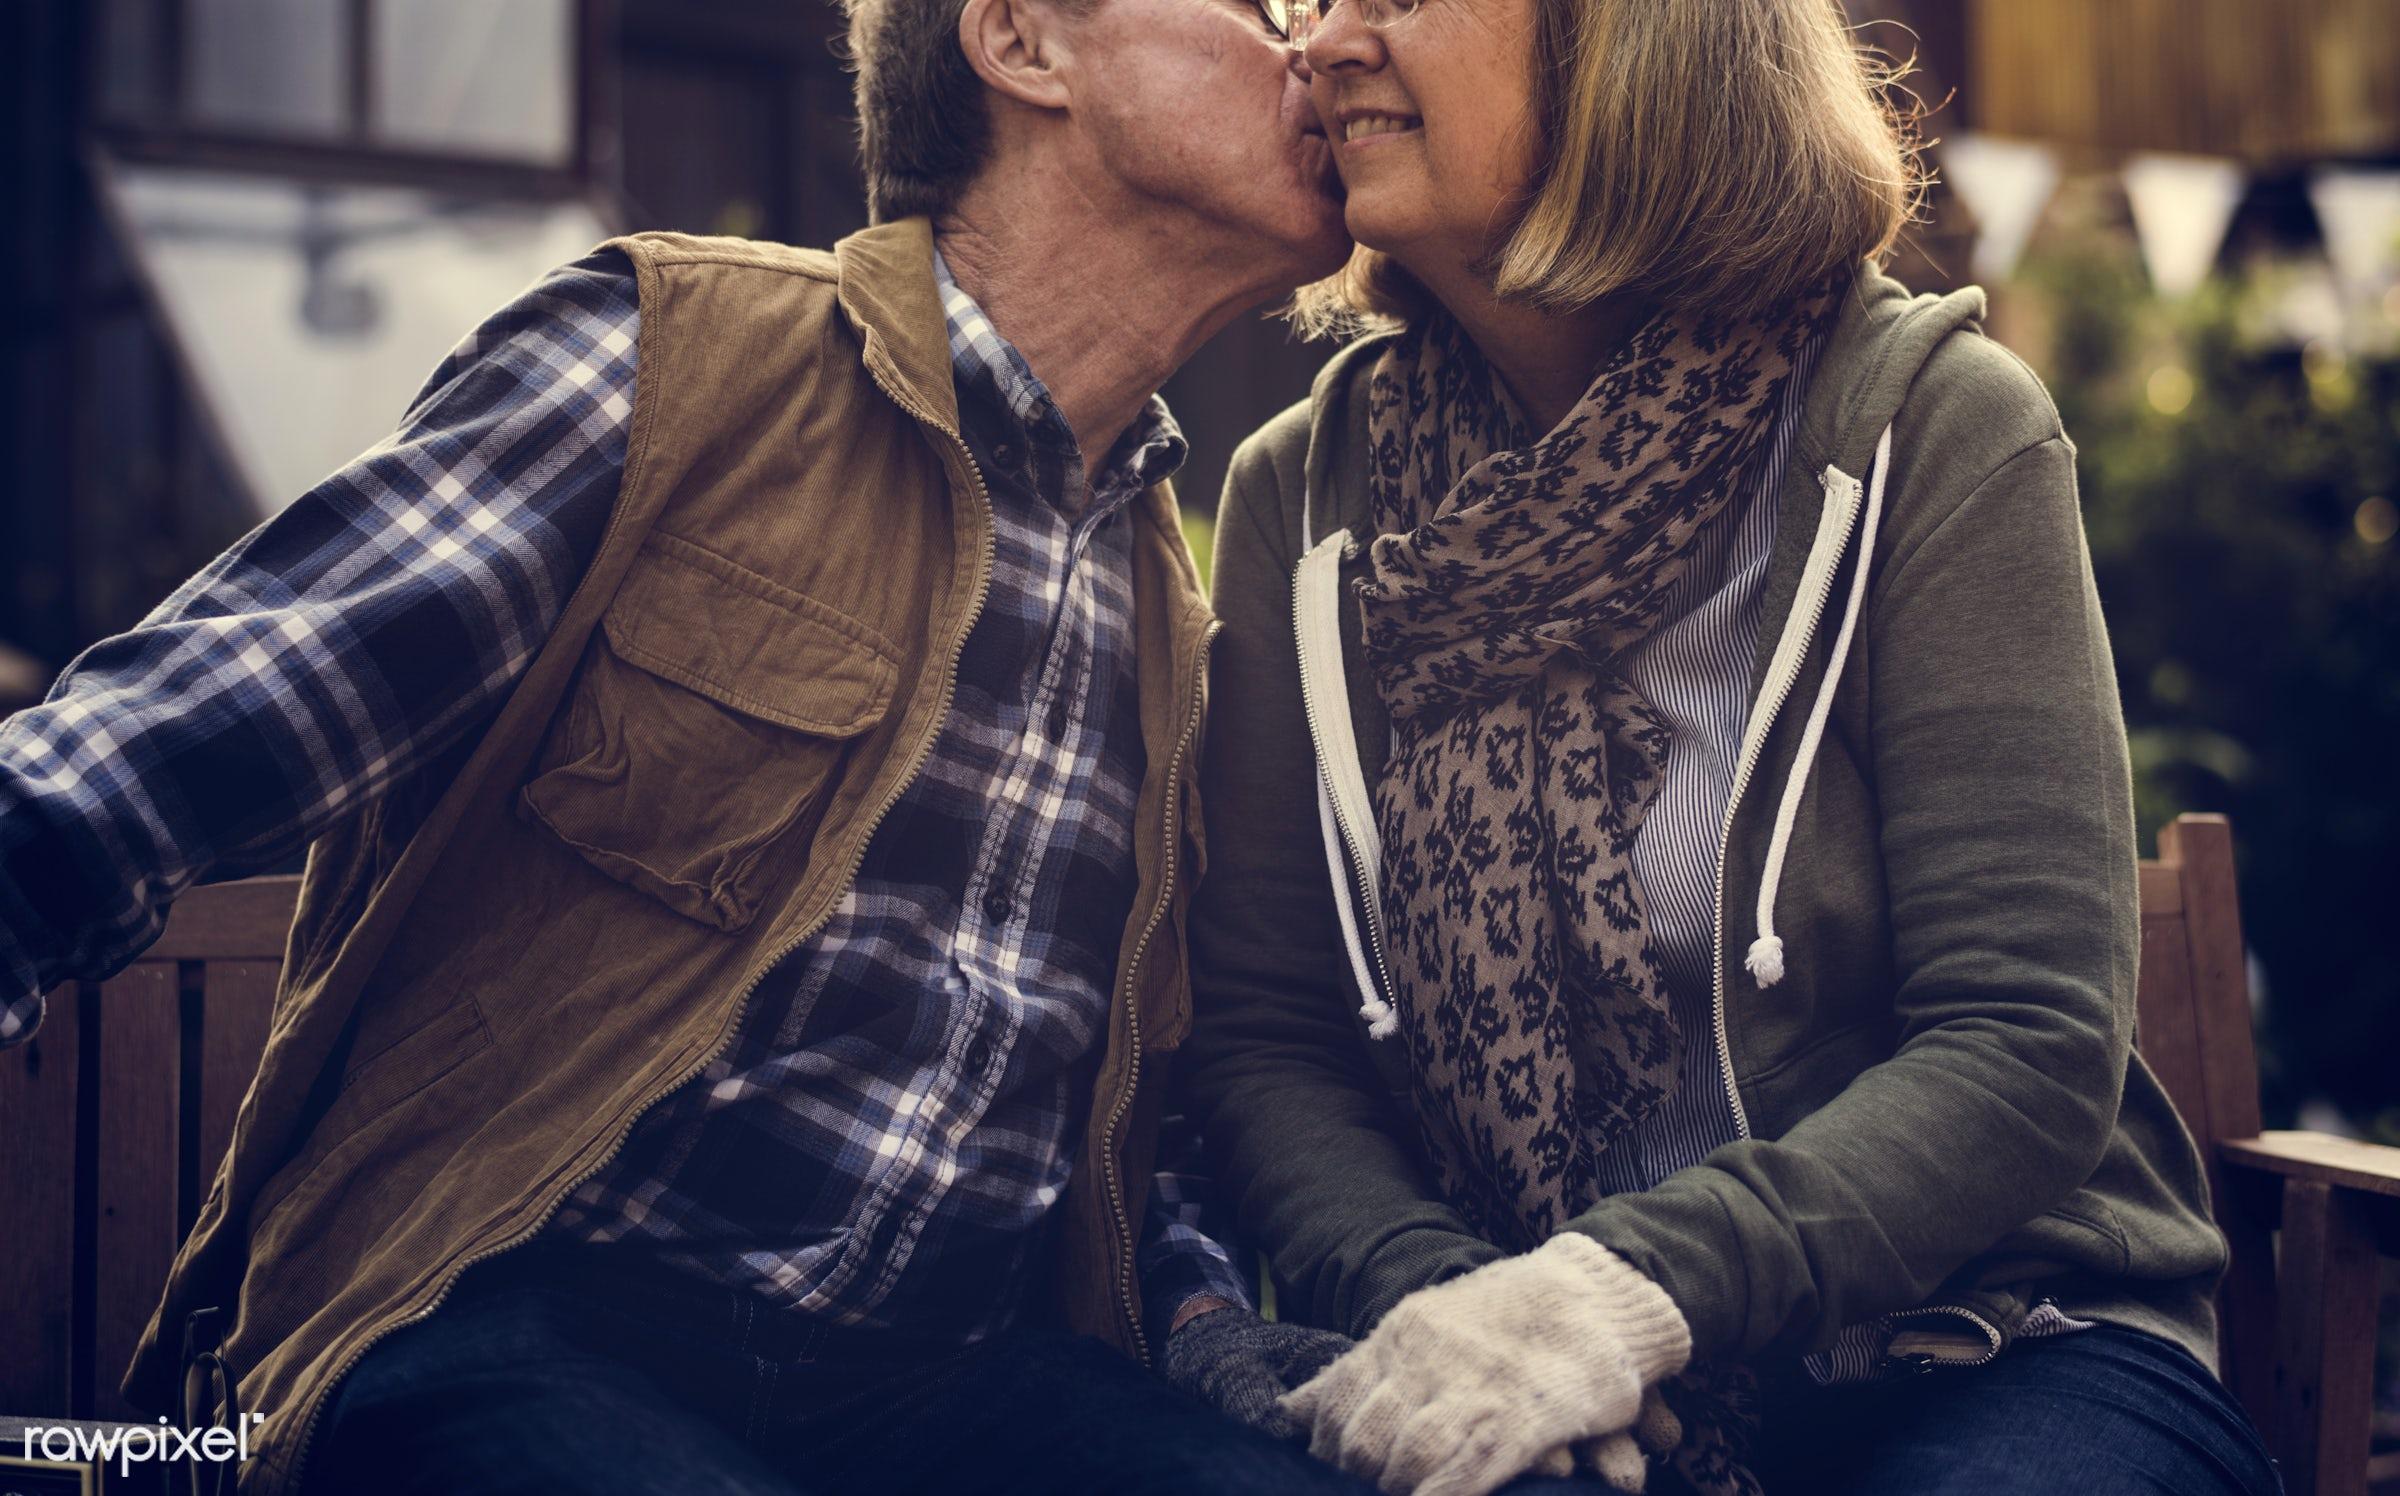 holding, bonding, holding hand, love, kiss, woman, family, lovely, couple, smile, cheerful, smiling, man, kissing, romance,...